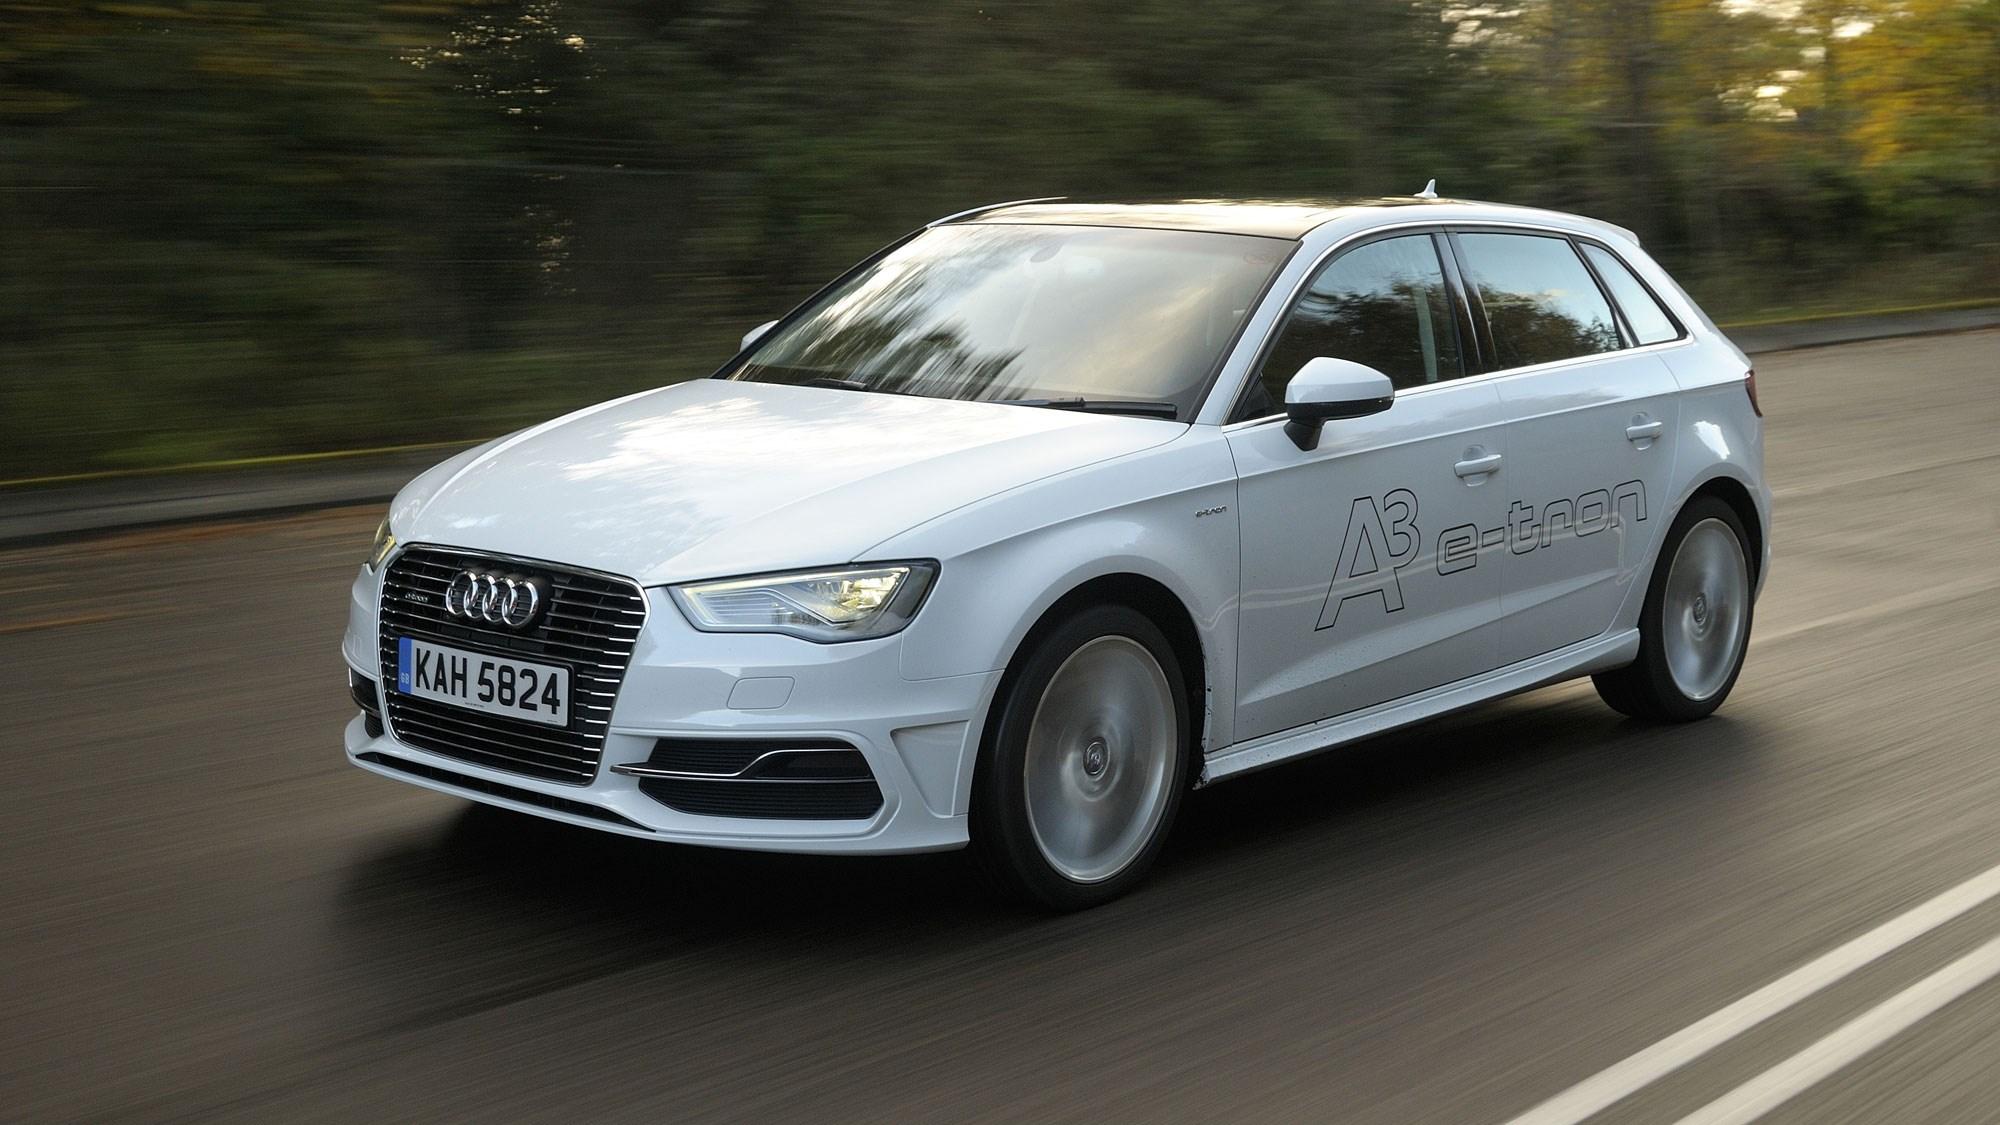 White 2014 Audi A3 Sportback e-Tron front three-quarter driving